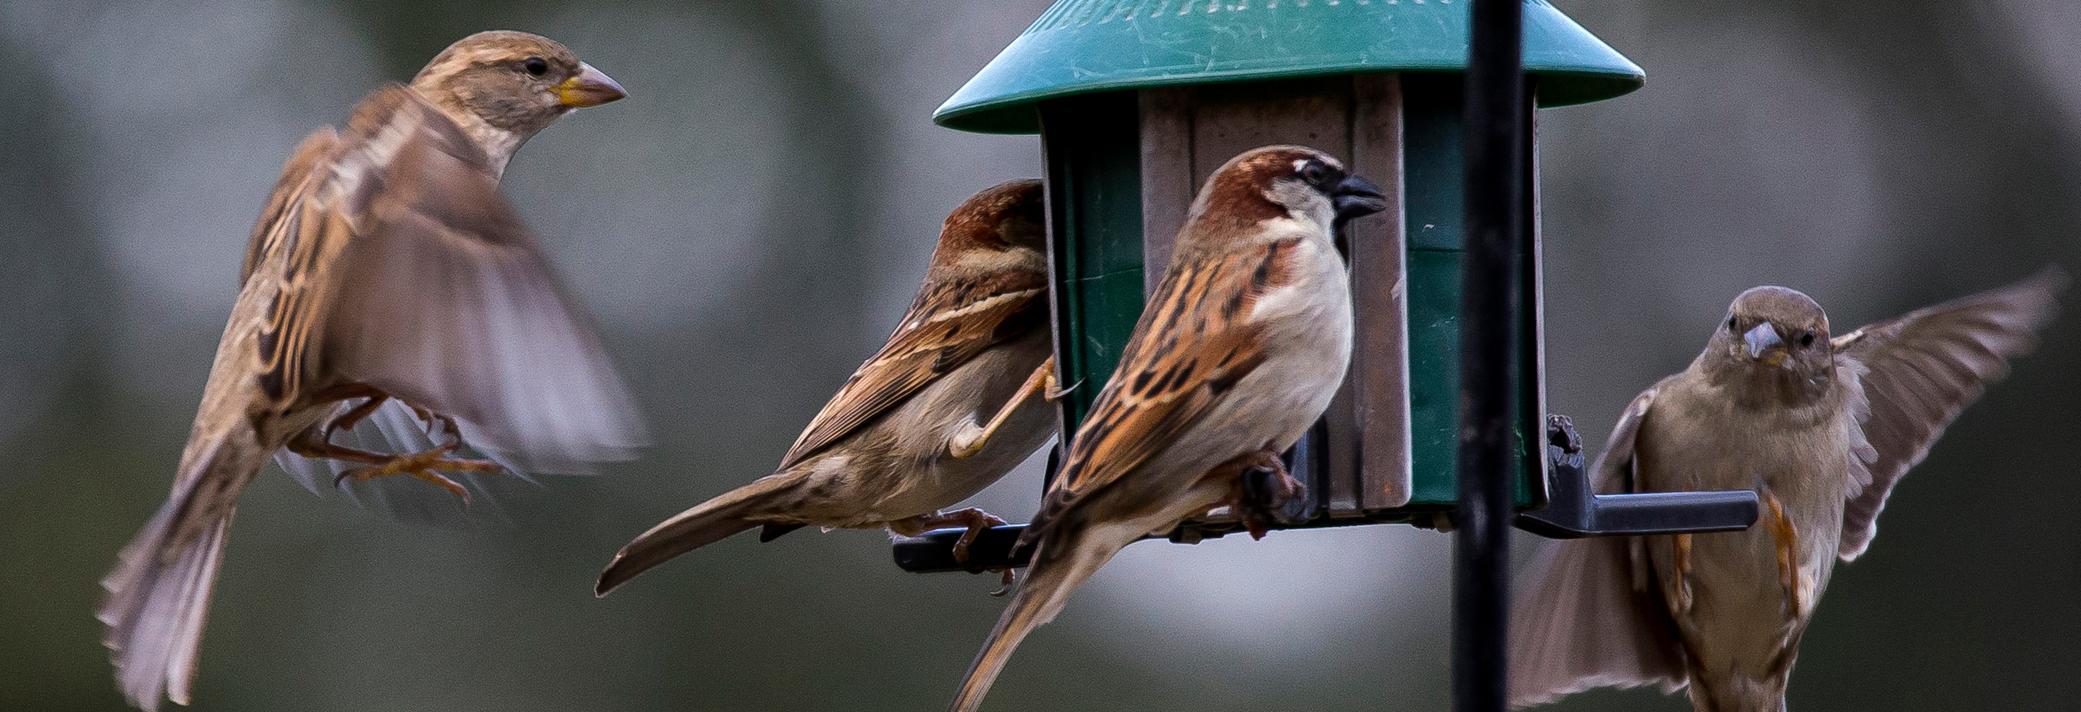 wild birds unlimited bird seed bird feeders florence kentucky